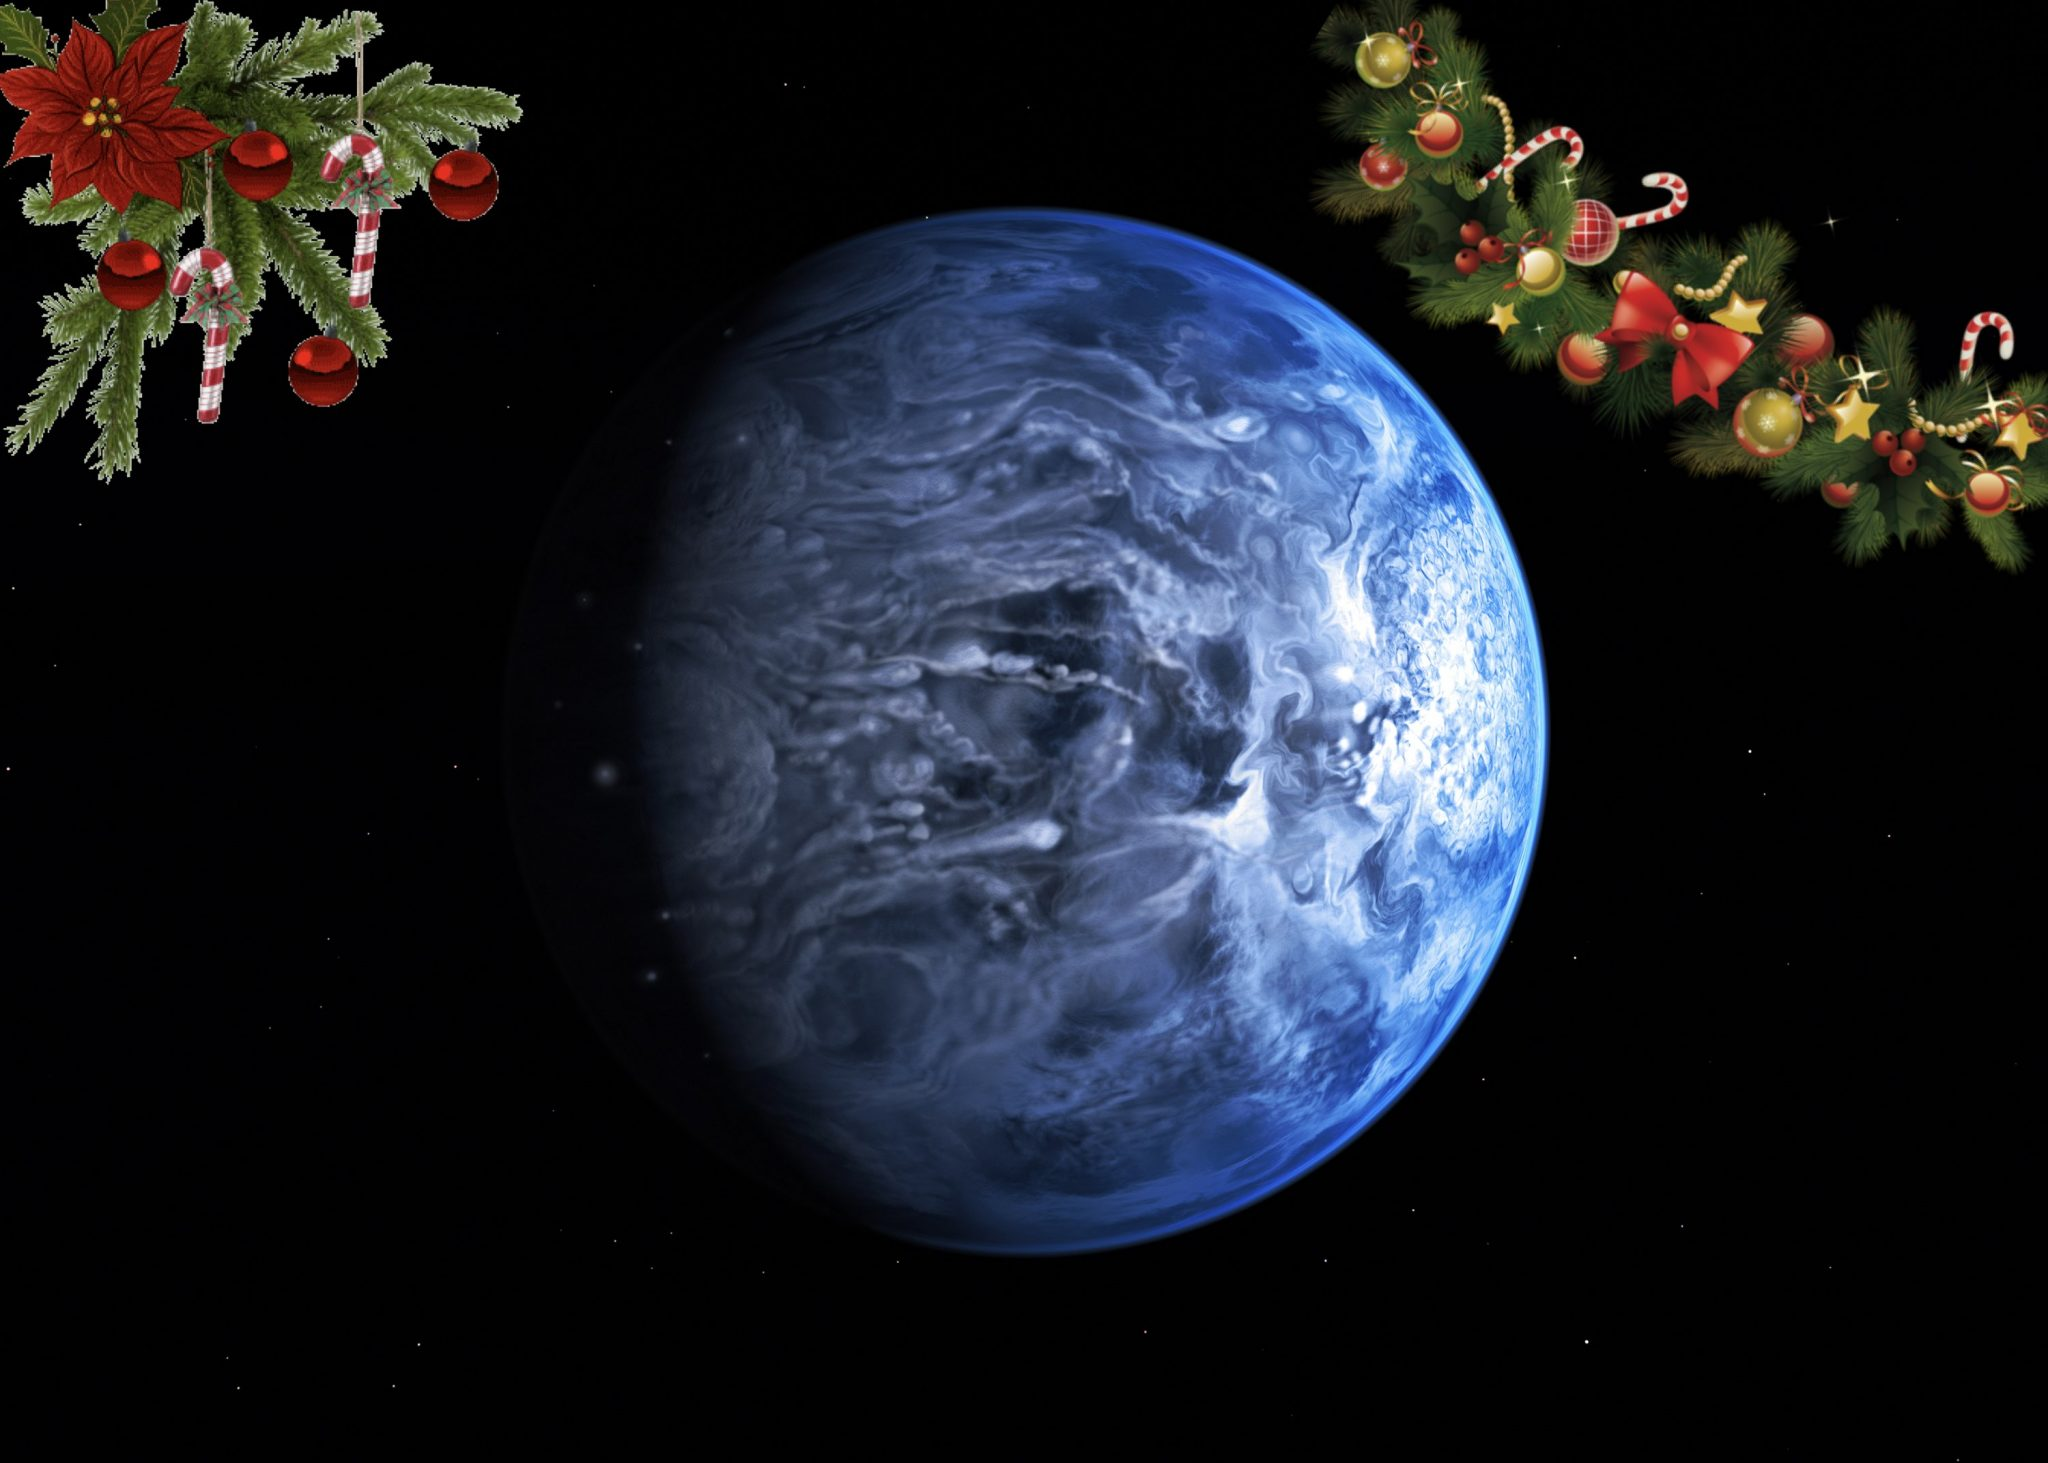 Rappresentazione artistica del pianeta HD 189733 A b, un pianeta blu Credit: ESO/M. Kornmesser